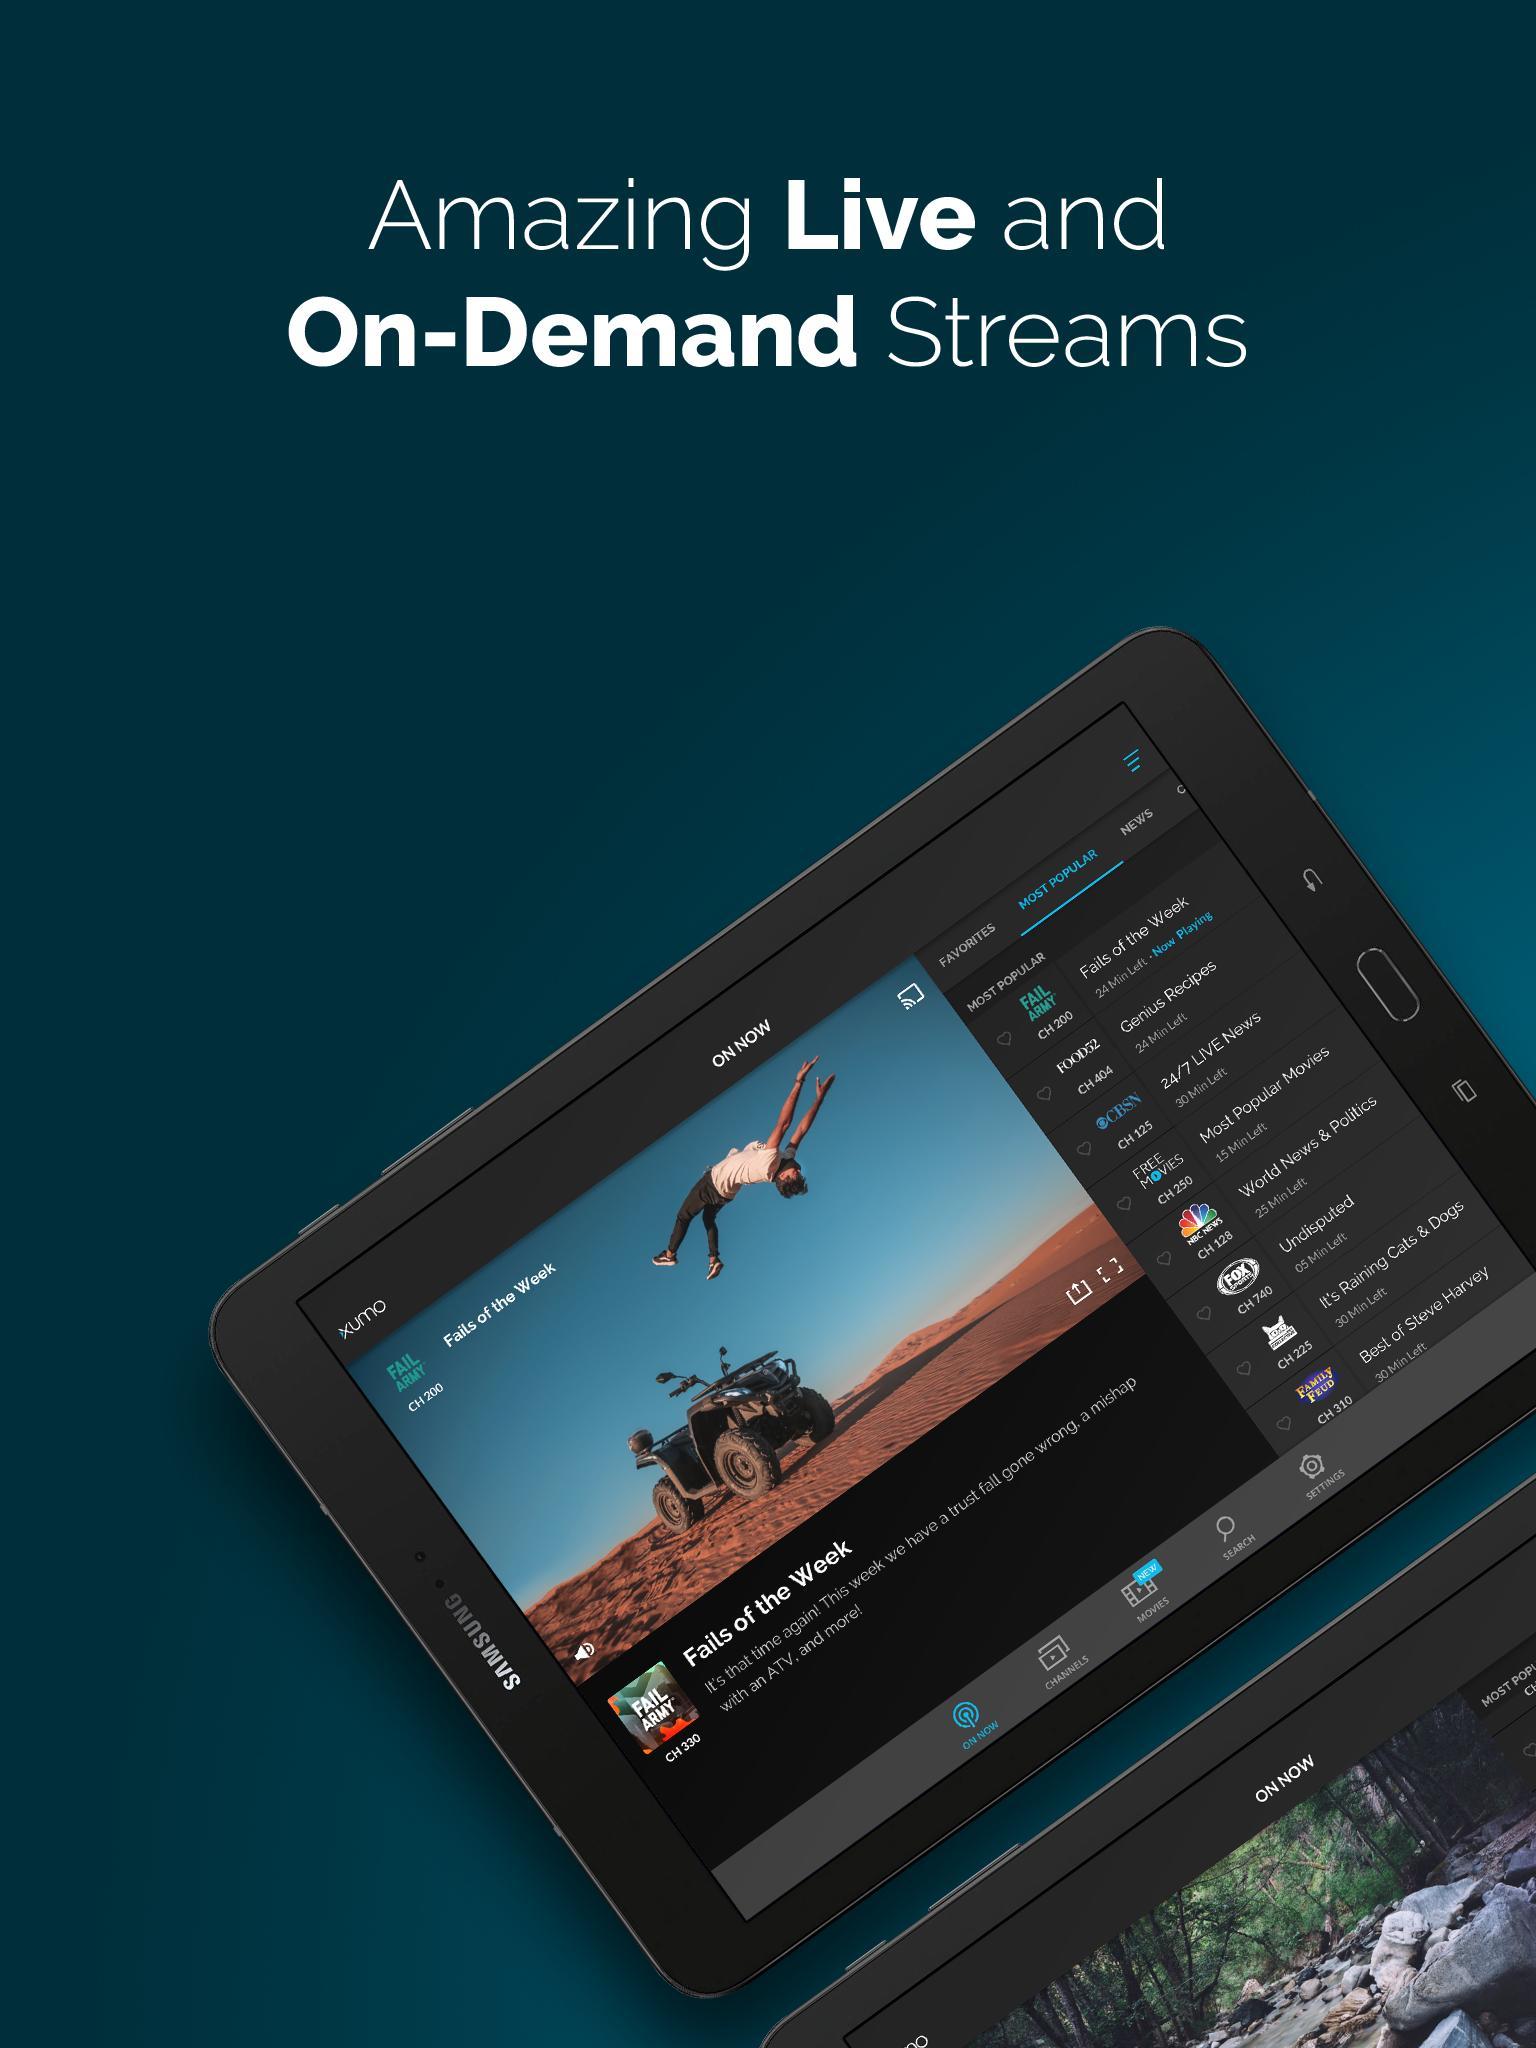 XUMO Free Streaming TV Shows and Movies 2.7.75 Screenshot 6